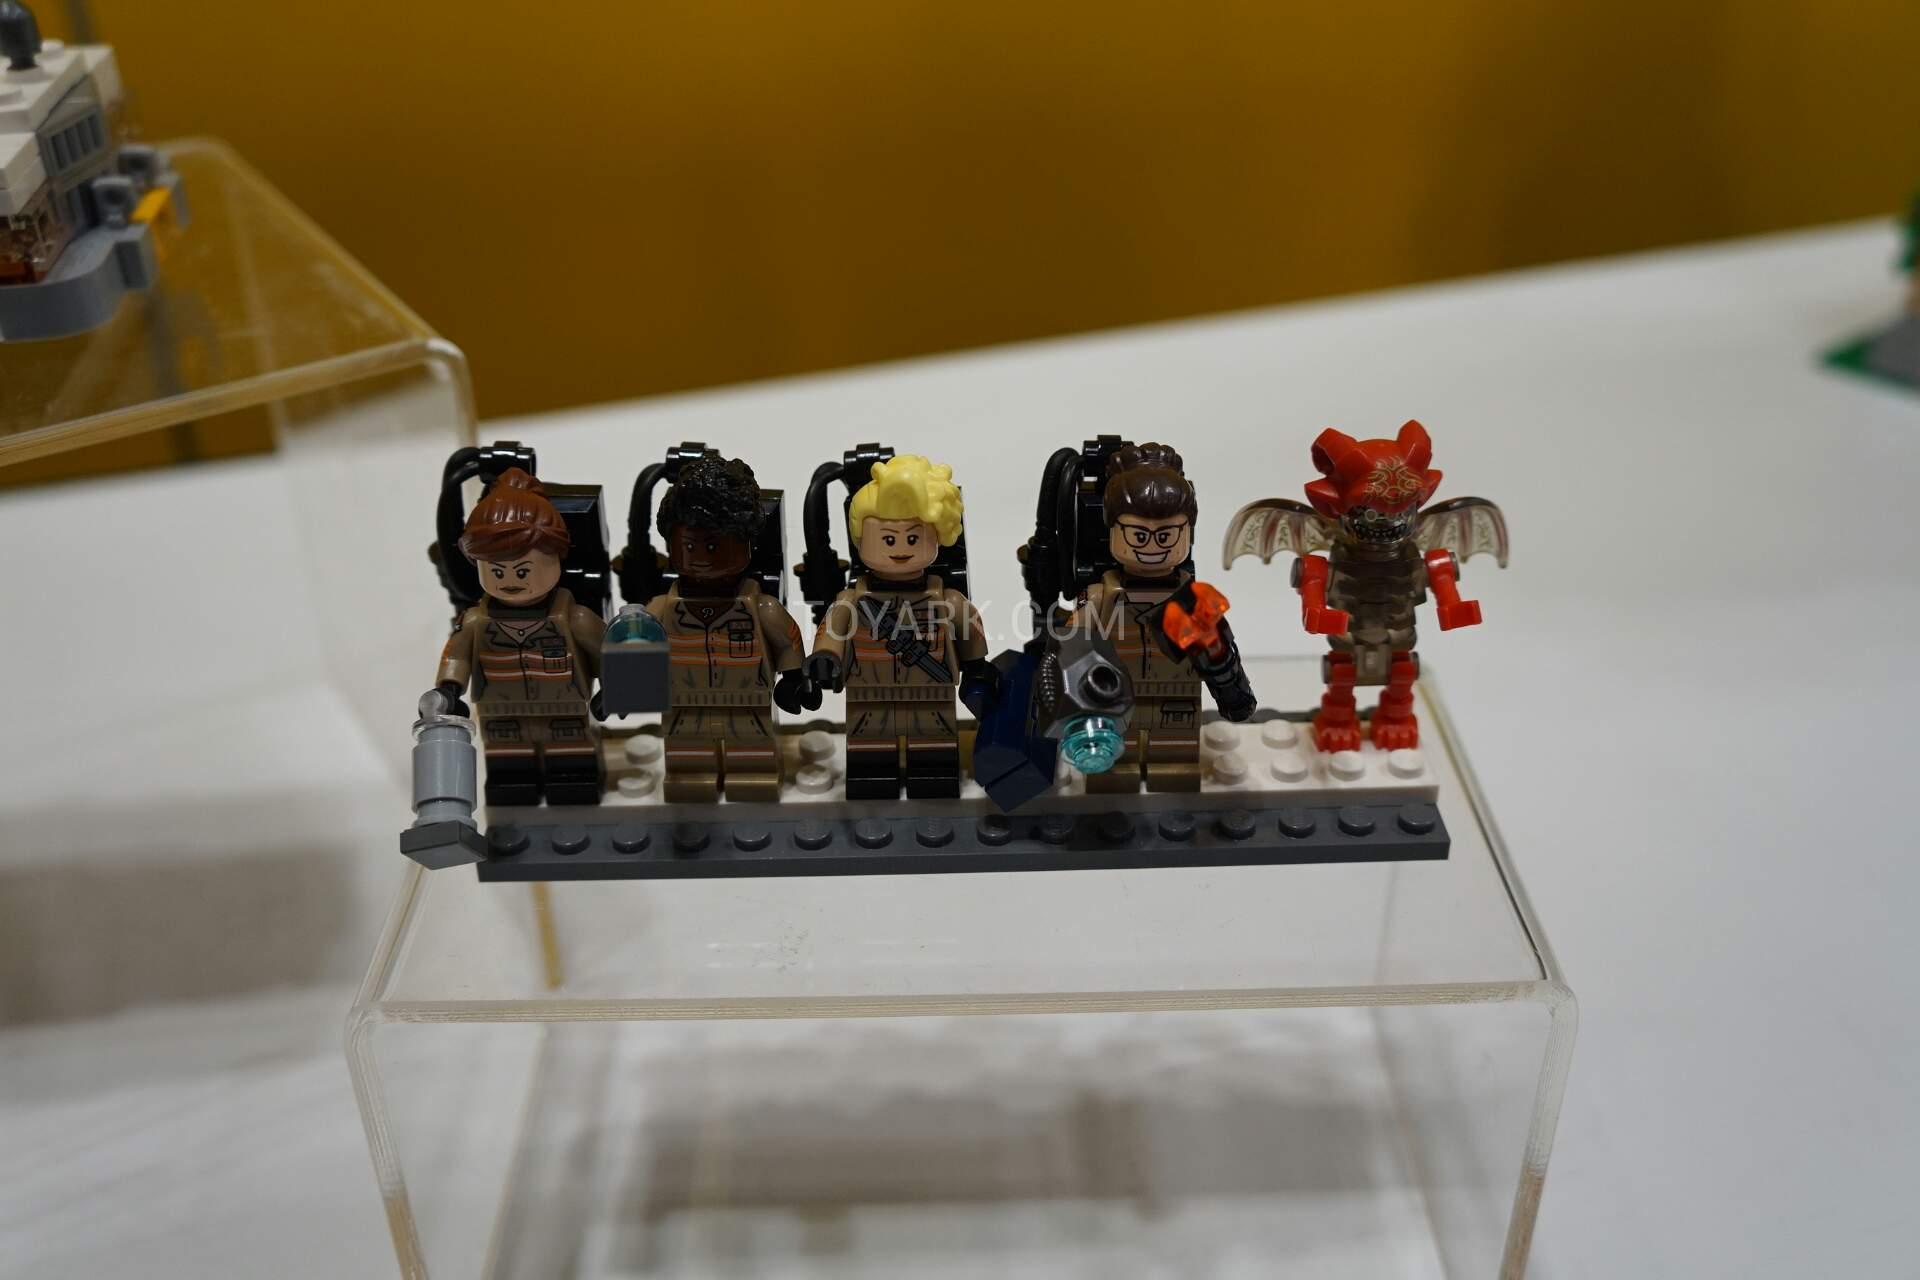 TF-2016-LEGO-2016-Ghostbusters-007.jpg